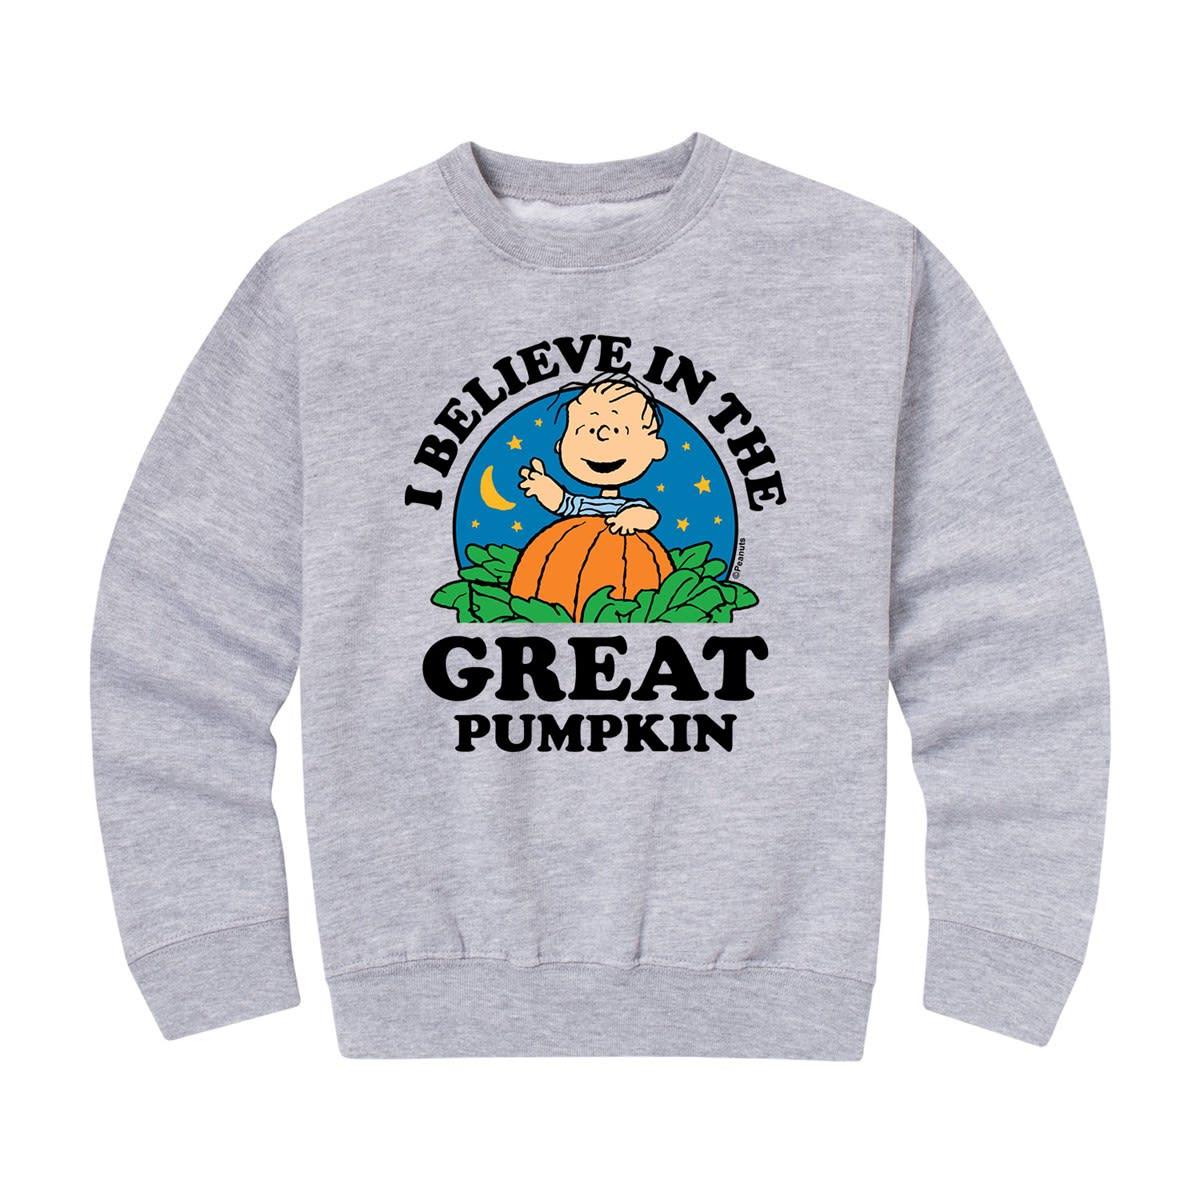 Kids Peanuts Halloween Fleece! .99 (REG .99) + Free Shipping at Jane!